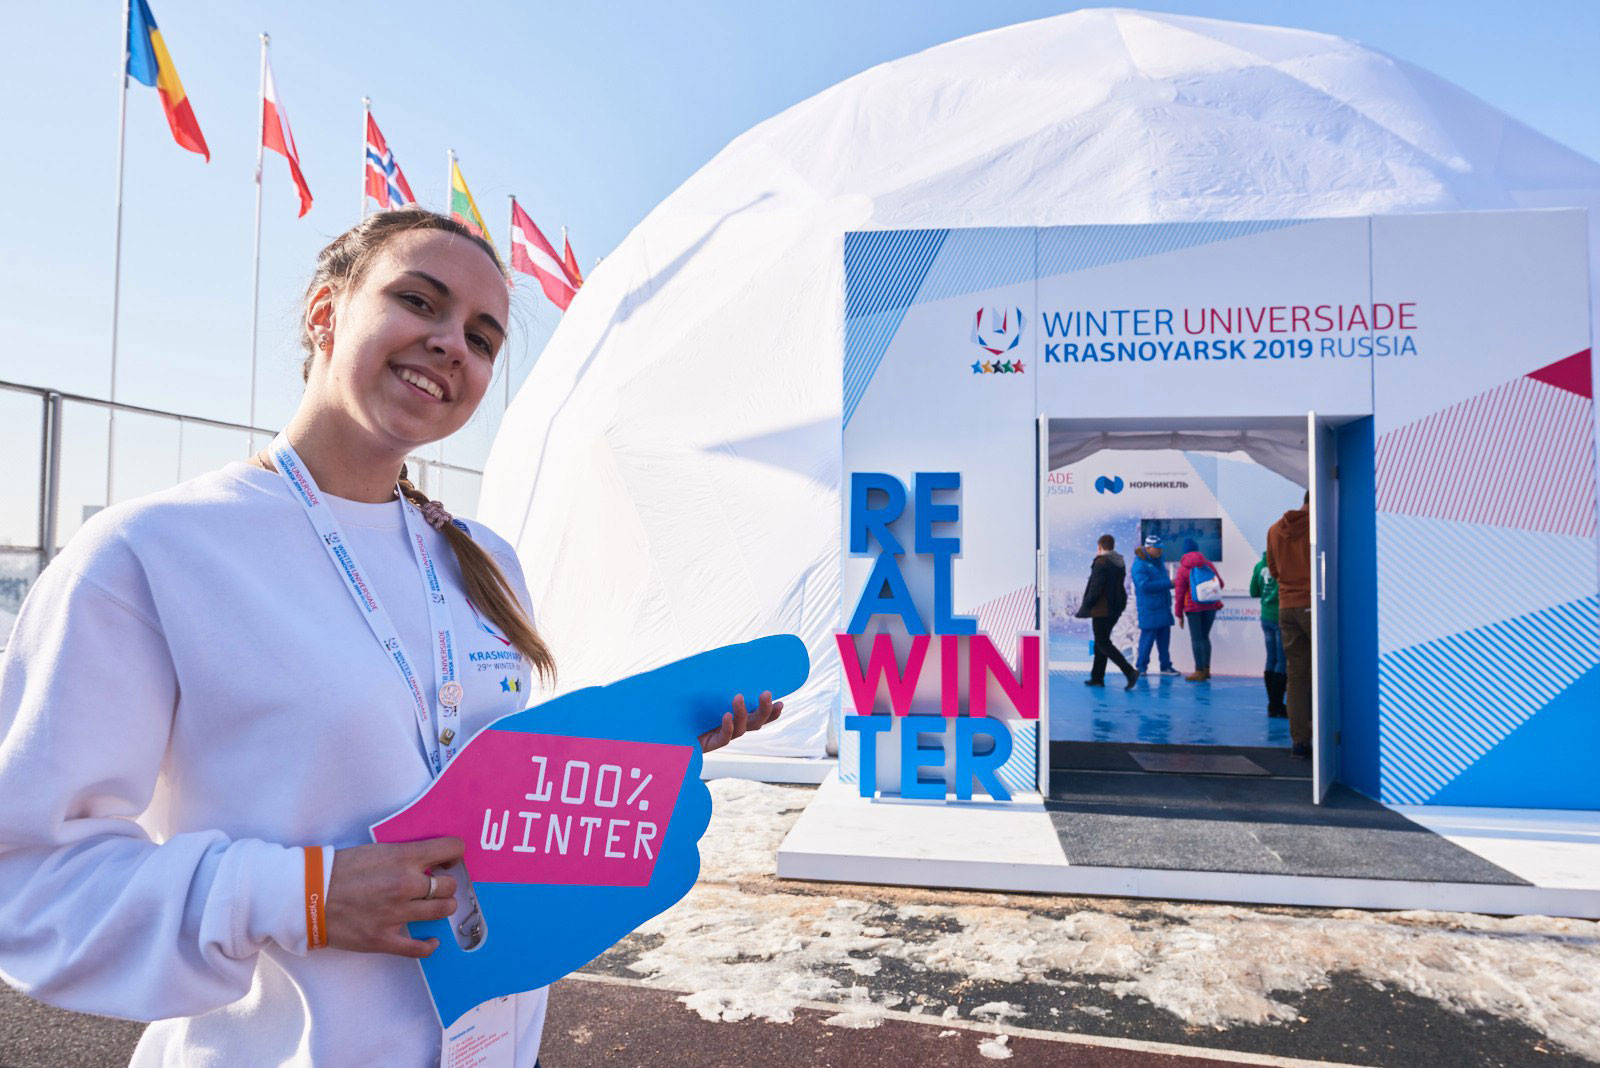 FISU President Oleg Matytsin hopes that a team from Ukraine will compete at the Krasnoyarsk 2019 ©Krasnoyarsk 2019